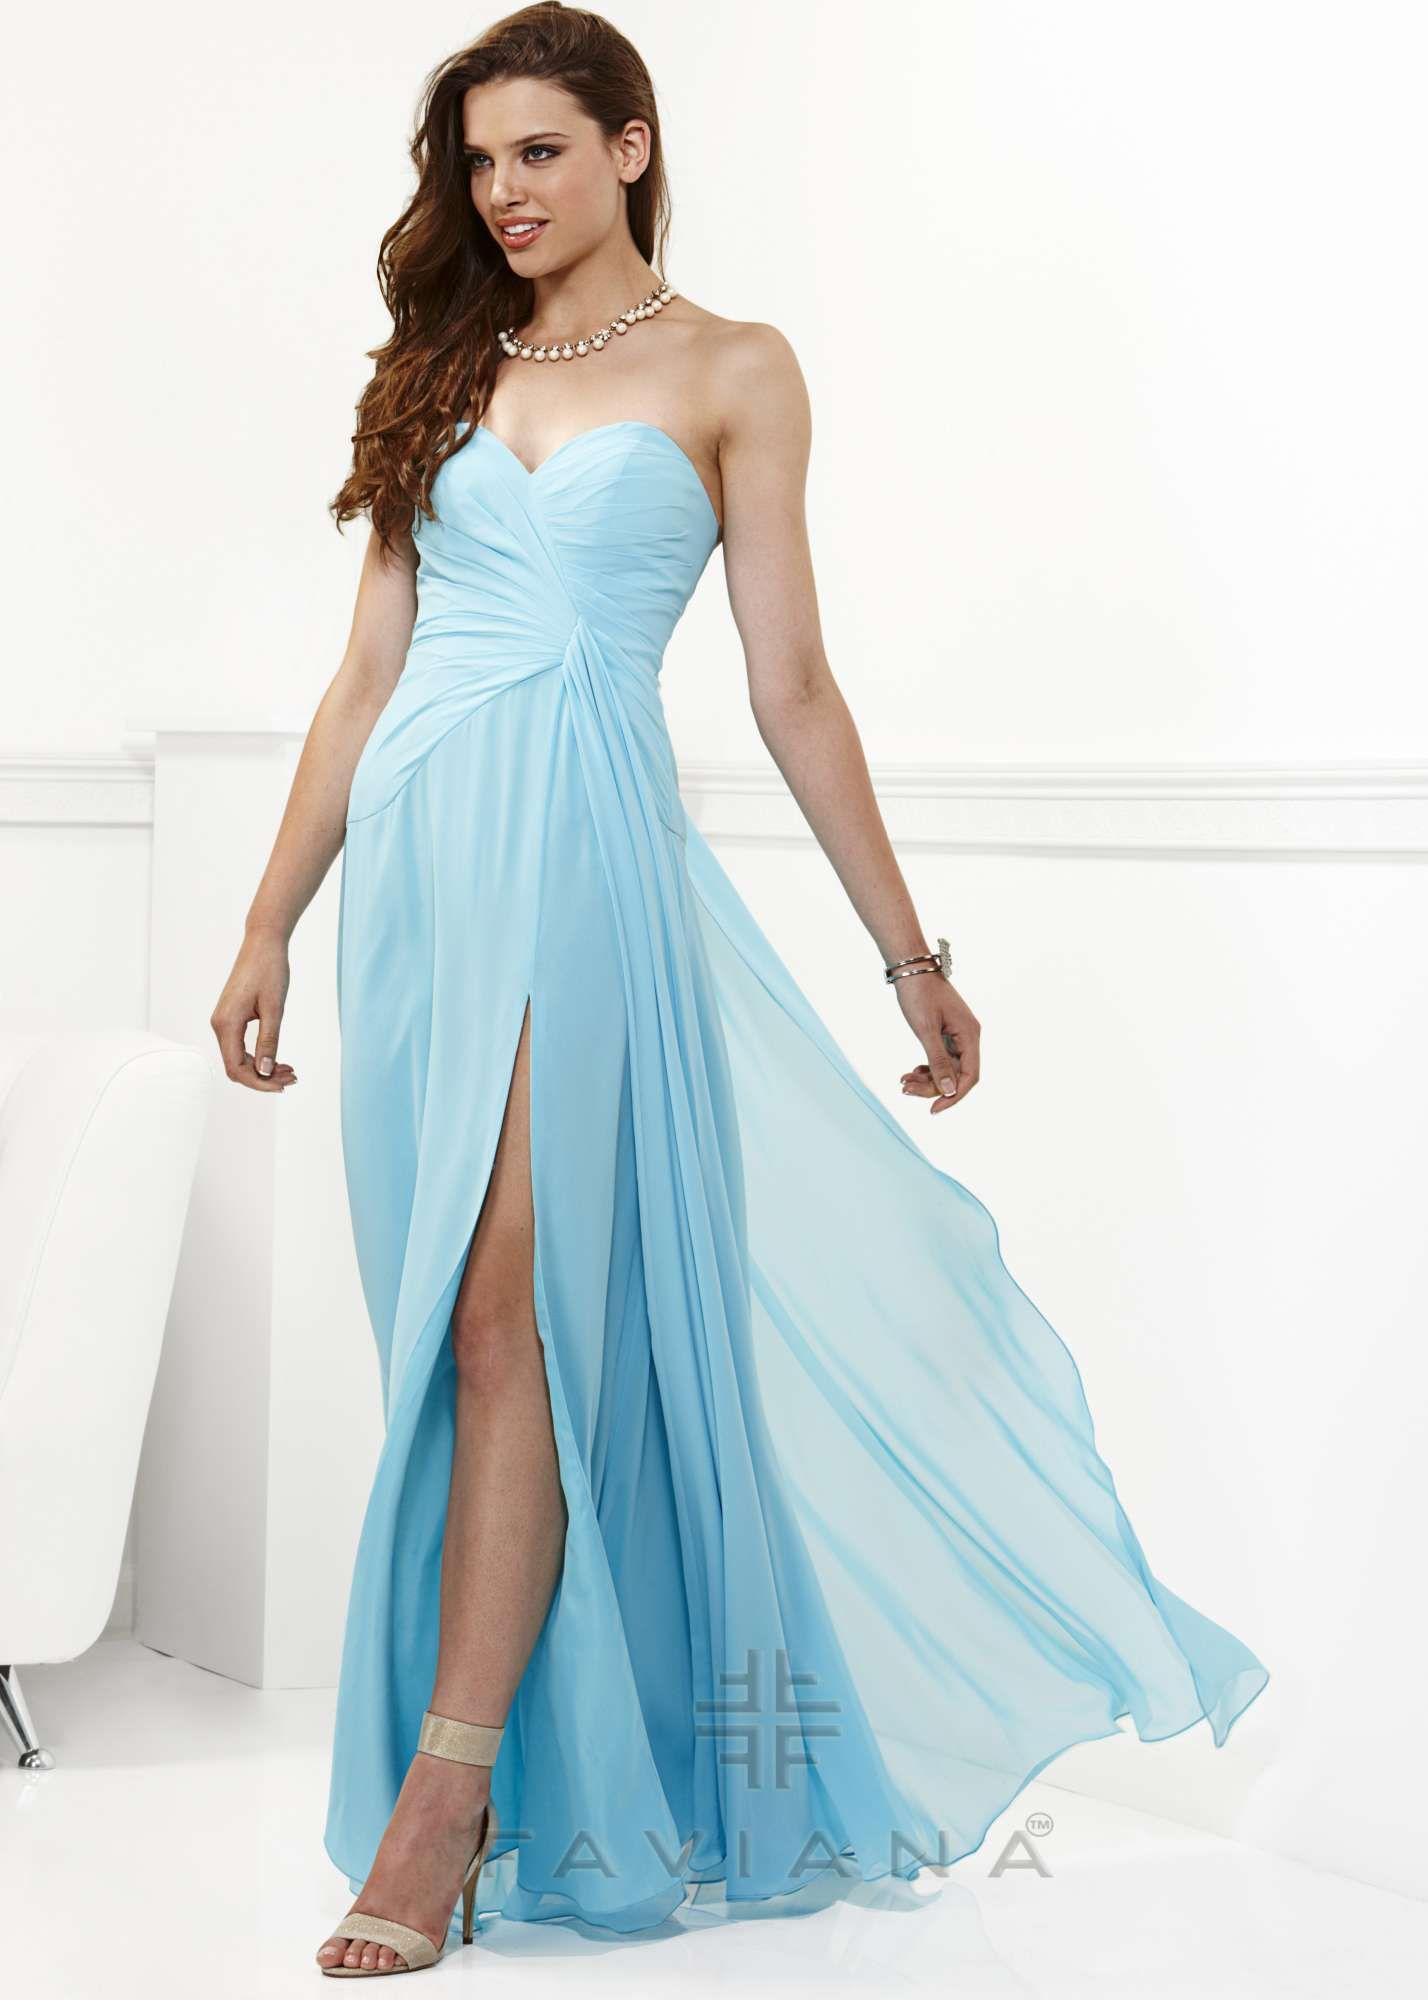 Shop 2014 prom dresses, Faviana 6428 blue strapless prom dress ...